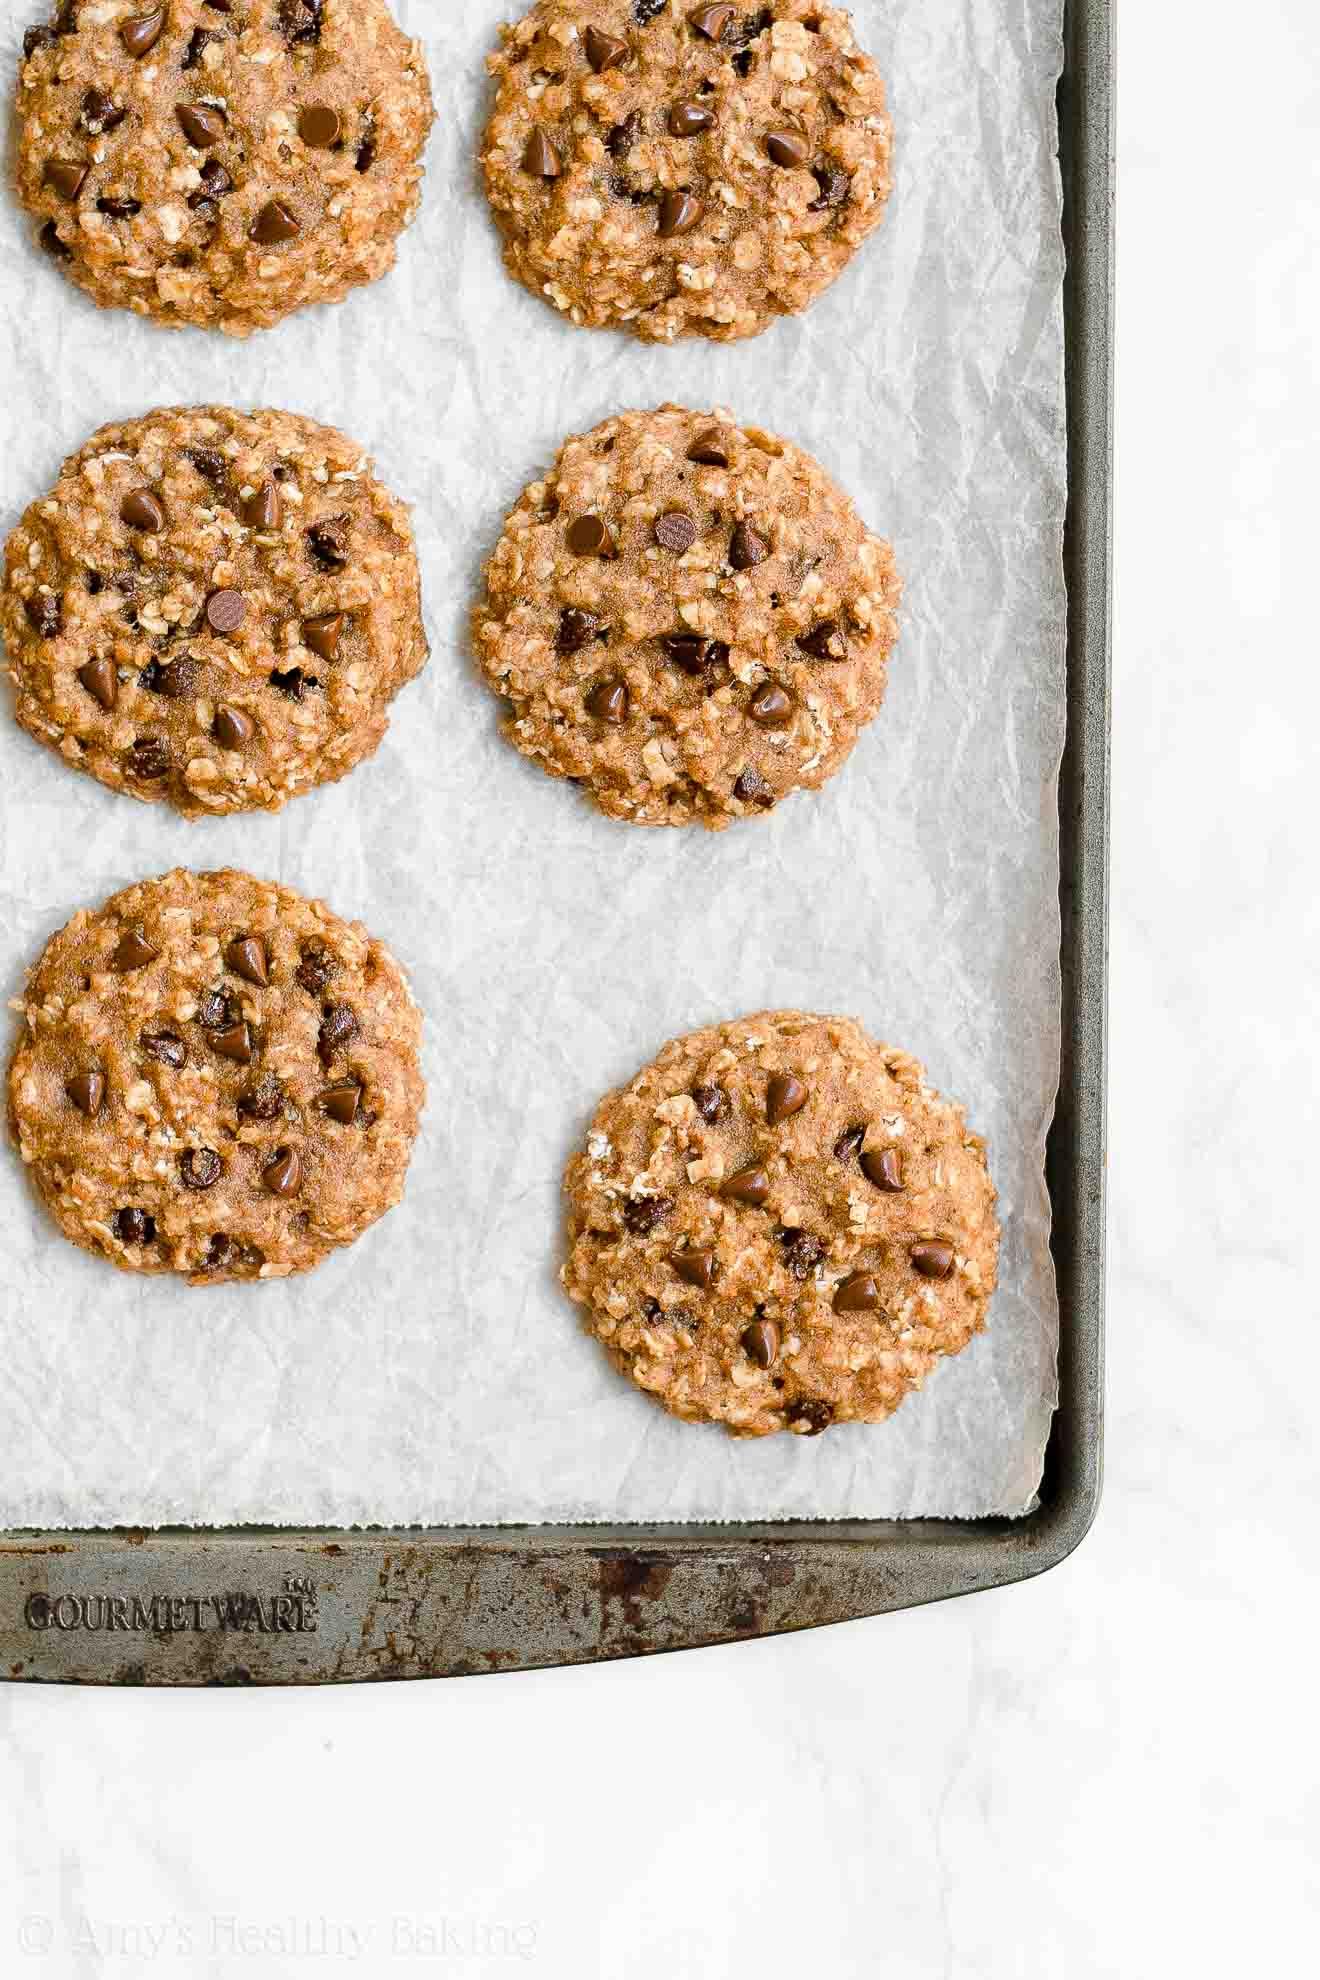 Easy Healthy Gluten Free Chocolate Chip Almond Butter Oatmeal Breakfast Cookies